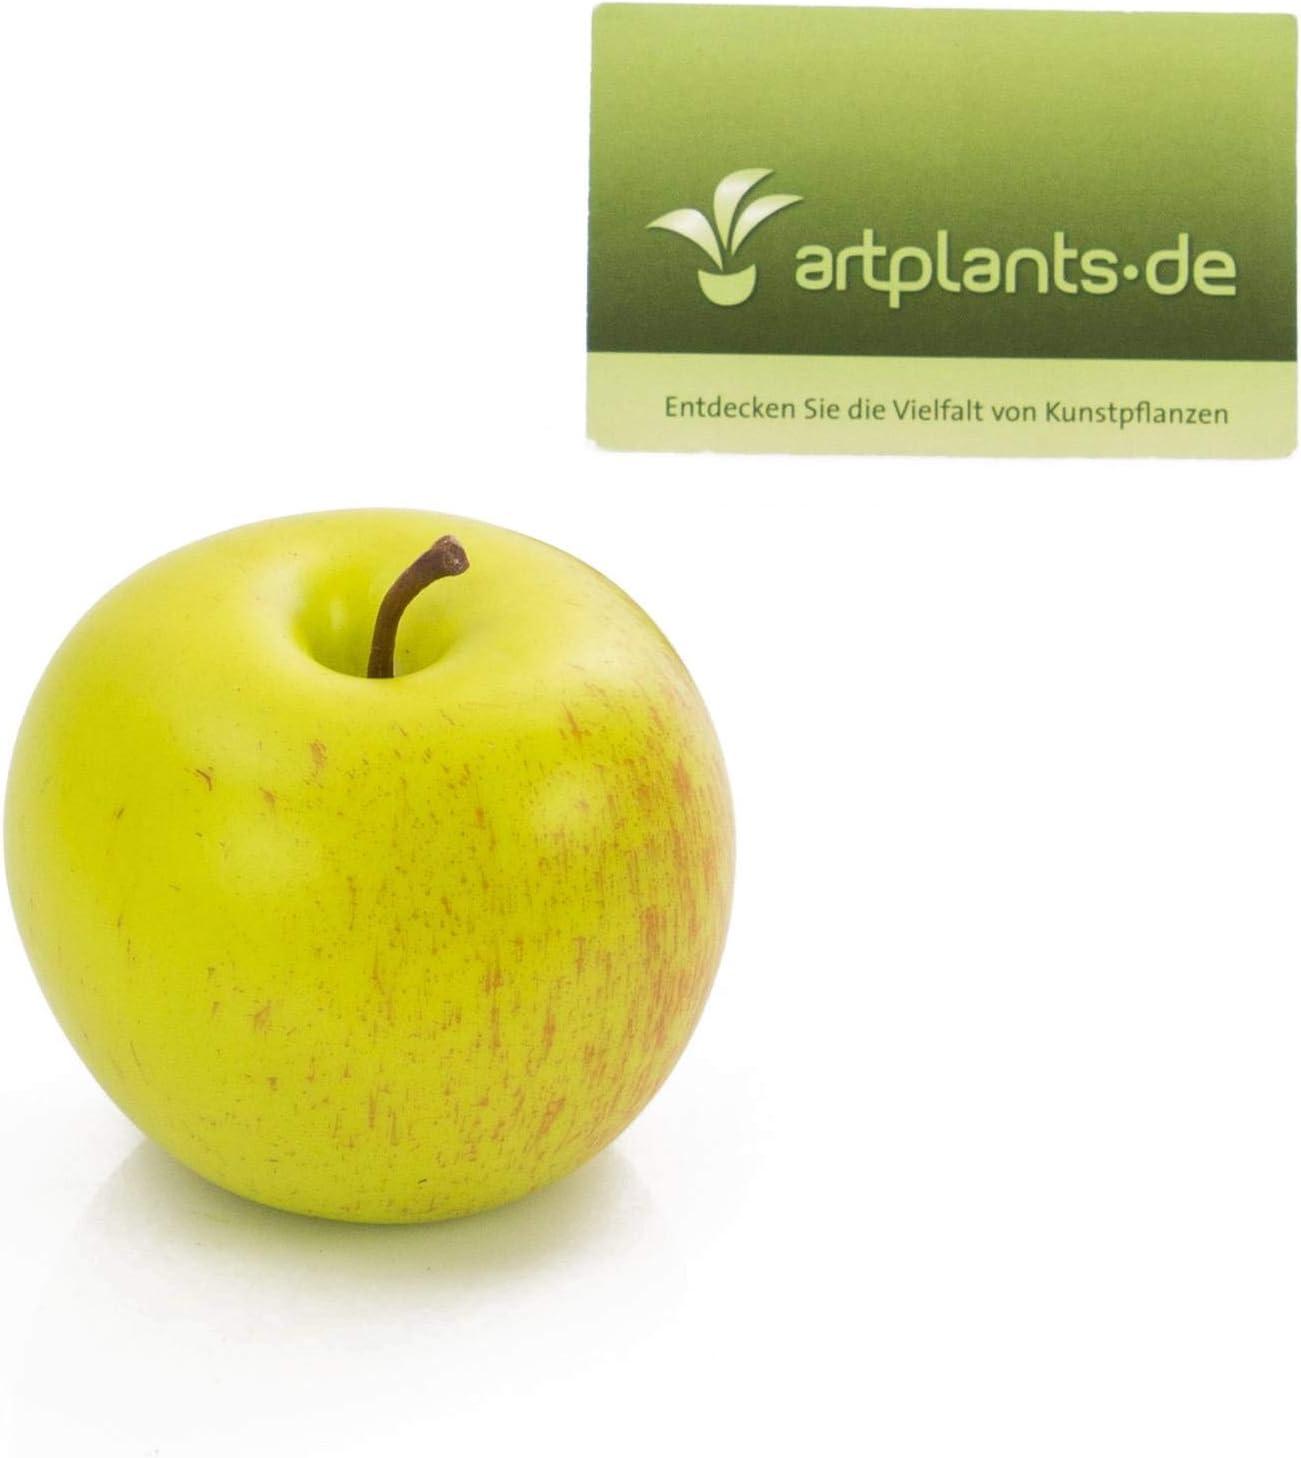 Fruit imitation//Decorative apple artplants.de Plastic apple /Ø 3.1//8cm green-red